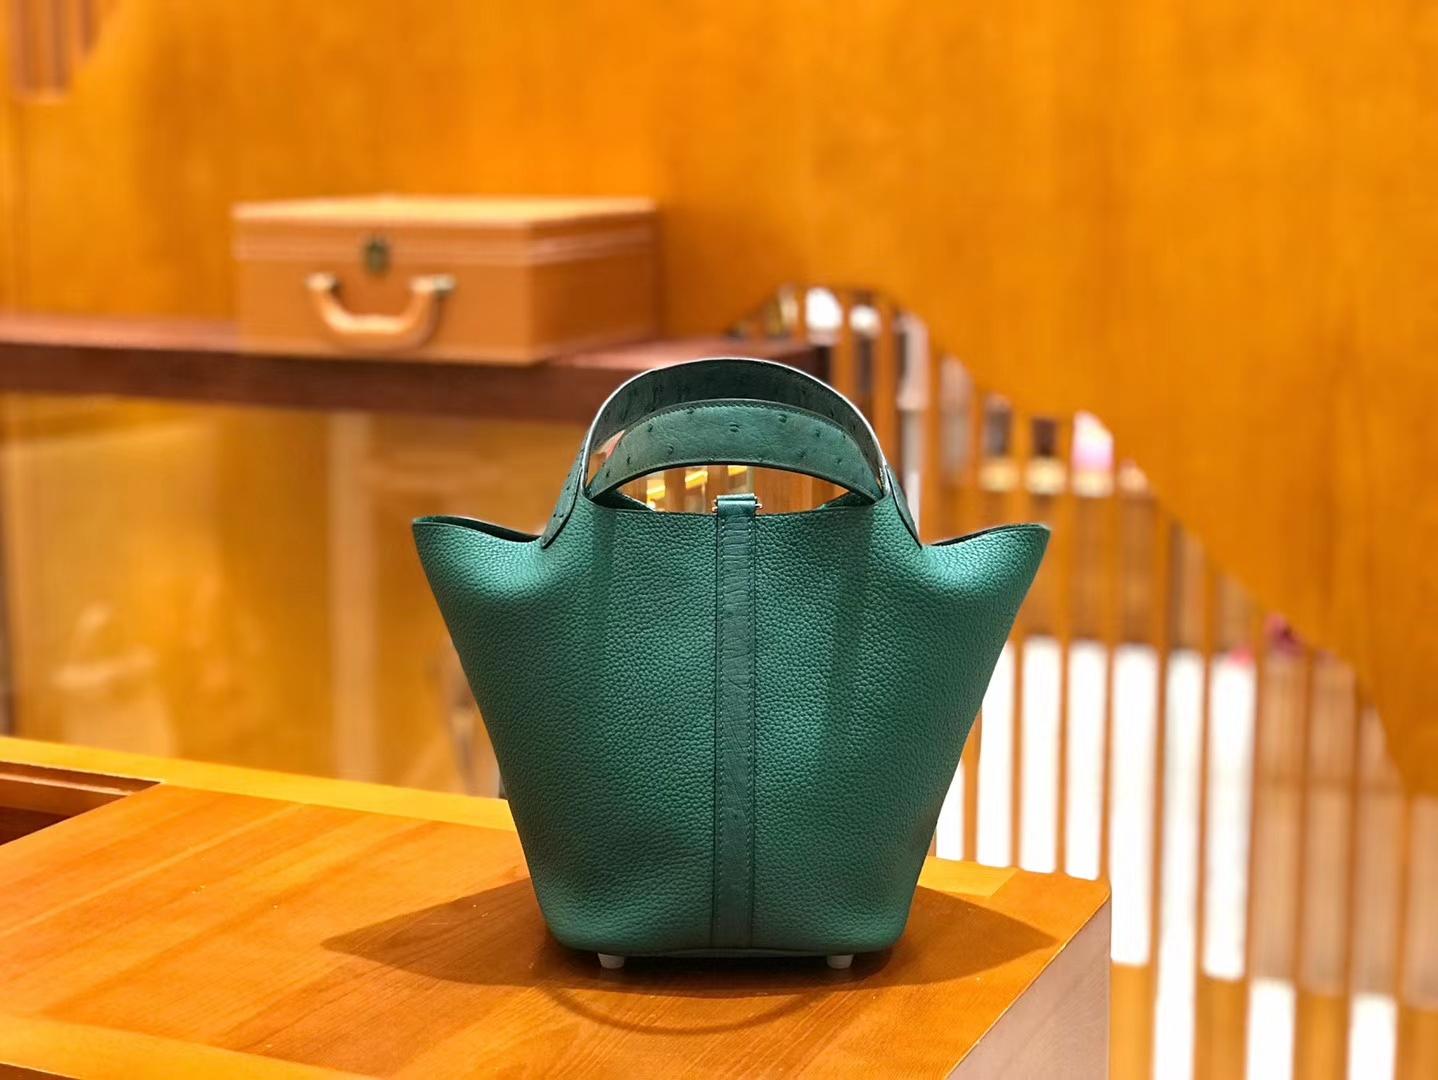 Hermès(爱马仕)Piction 18cm 丝绒绿 银扣 鸵鸟皮拼小牛皮 全手工缝制